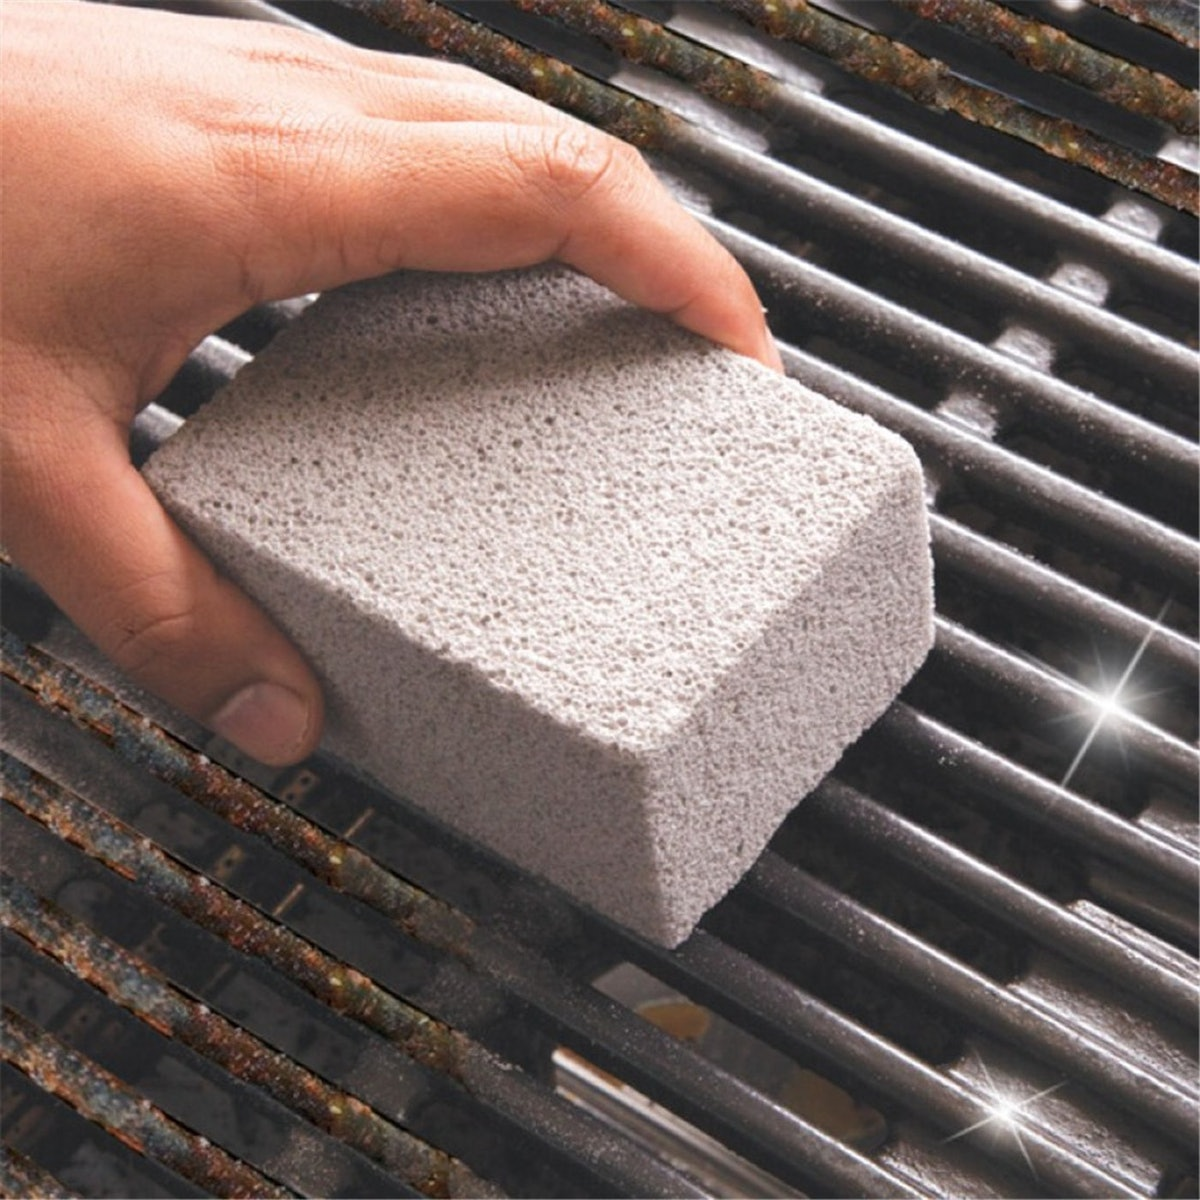 Elaziy Griddle Cleaning Bricks (4 Pack)